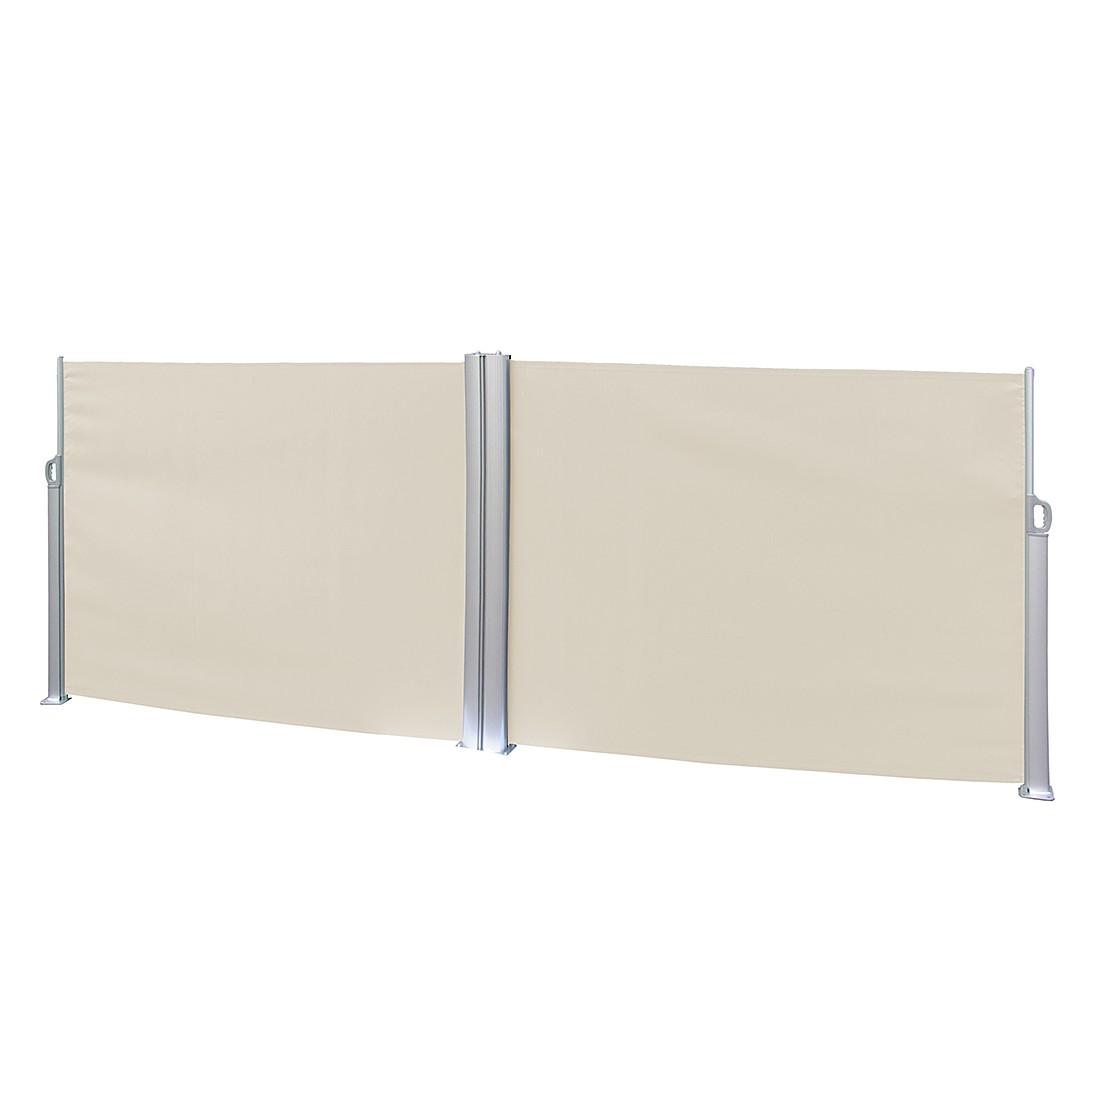 Doppel-Seitenmarkise Rush - Aluminium/Polyester - Natur, Leco